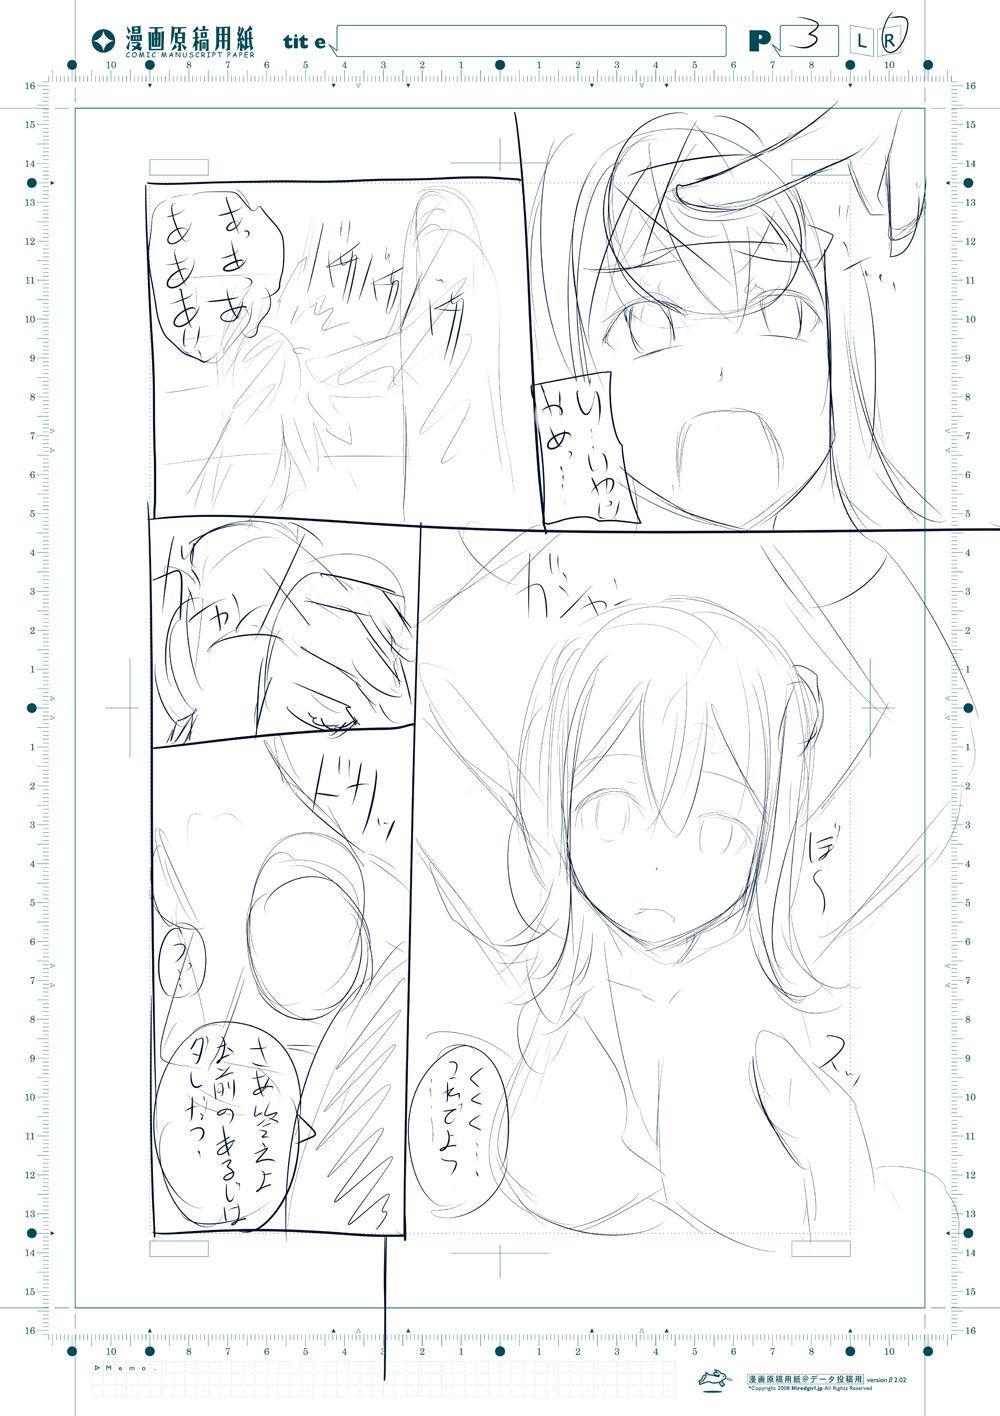 Goblin Slayer Sennou Manga 16